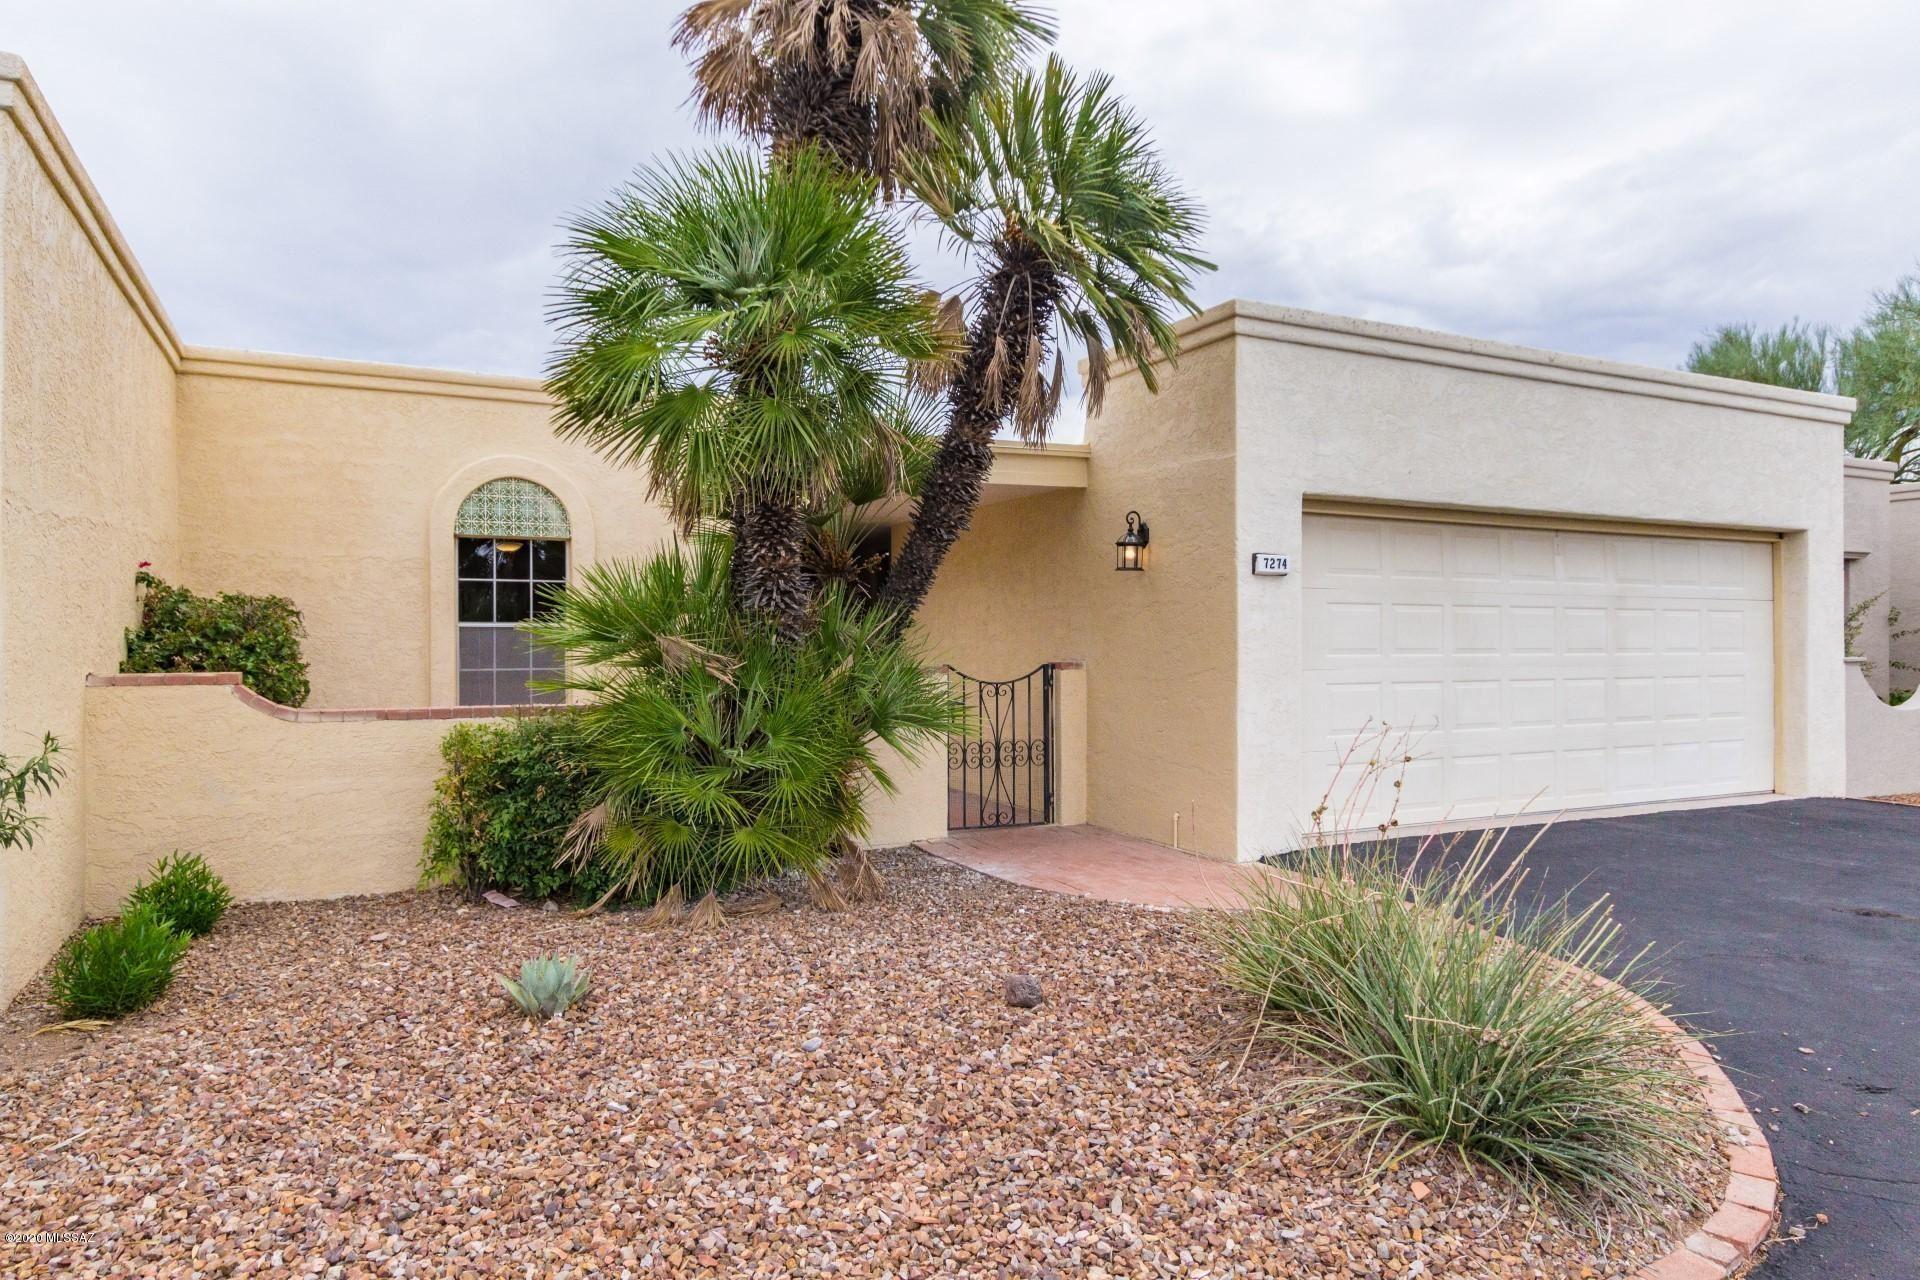 7274 E Camino Valle Verde, Tucson, AZ 85715 - #: 22013897